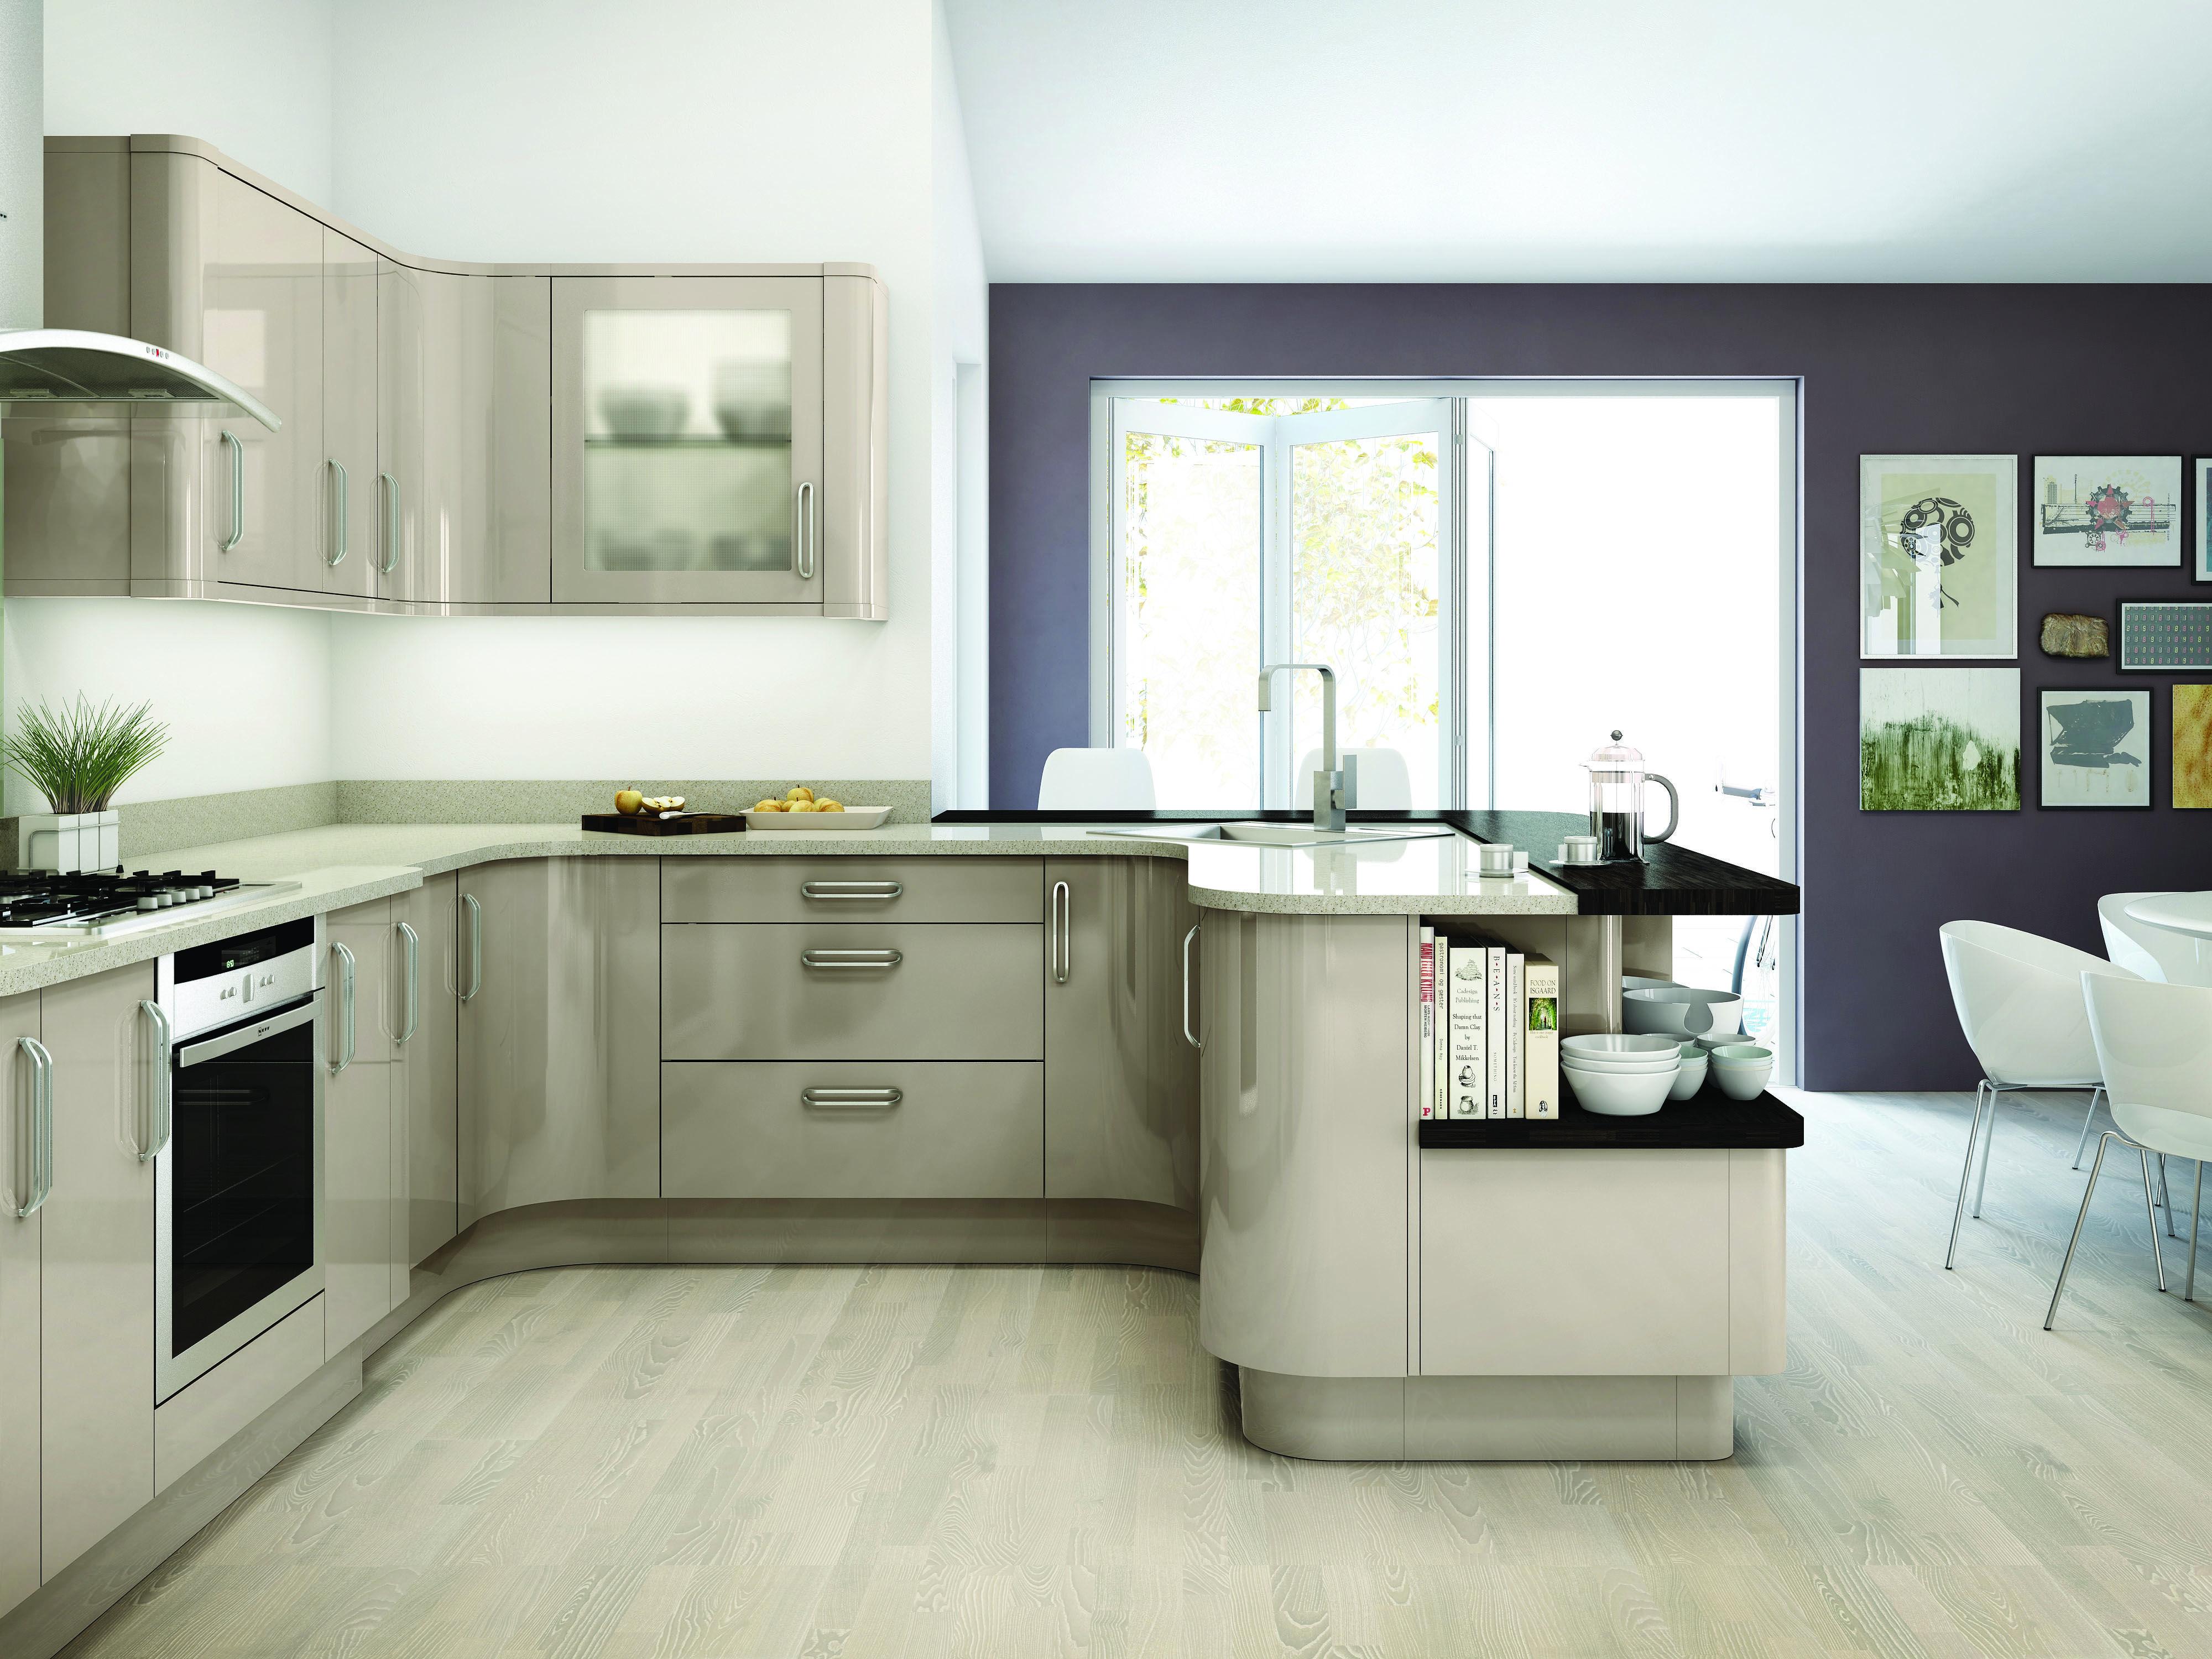 Most Expensive Kitchen Expensive Kitchen The World S Most Expensive Kitchen With Images Contemporary Kitchen